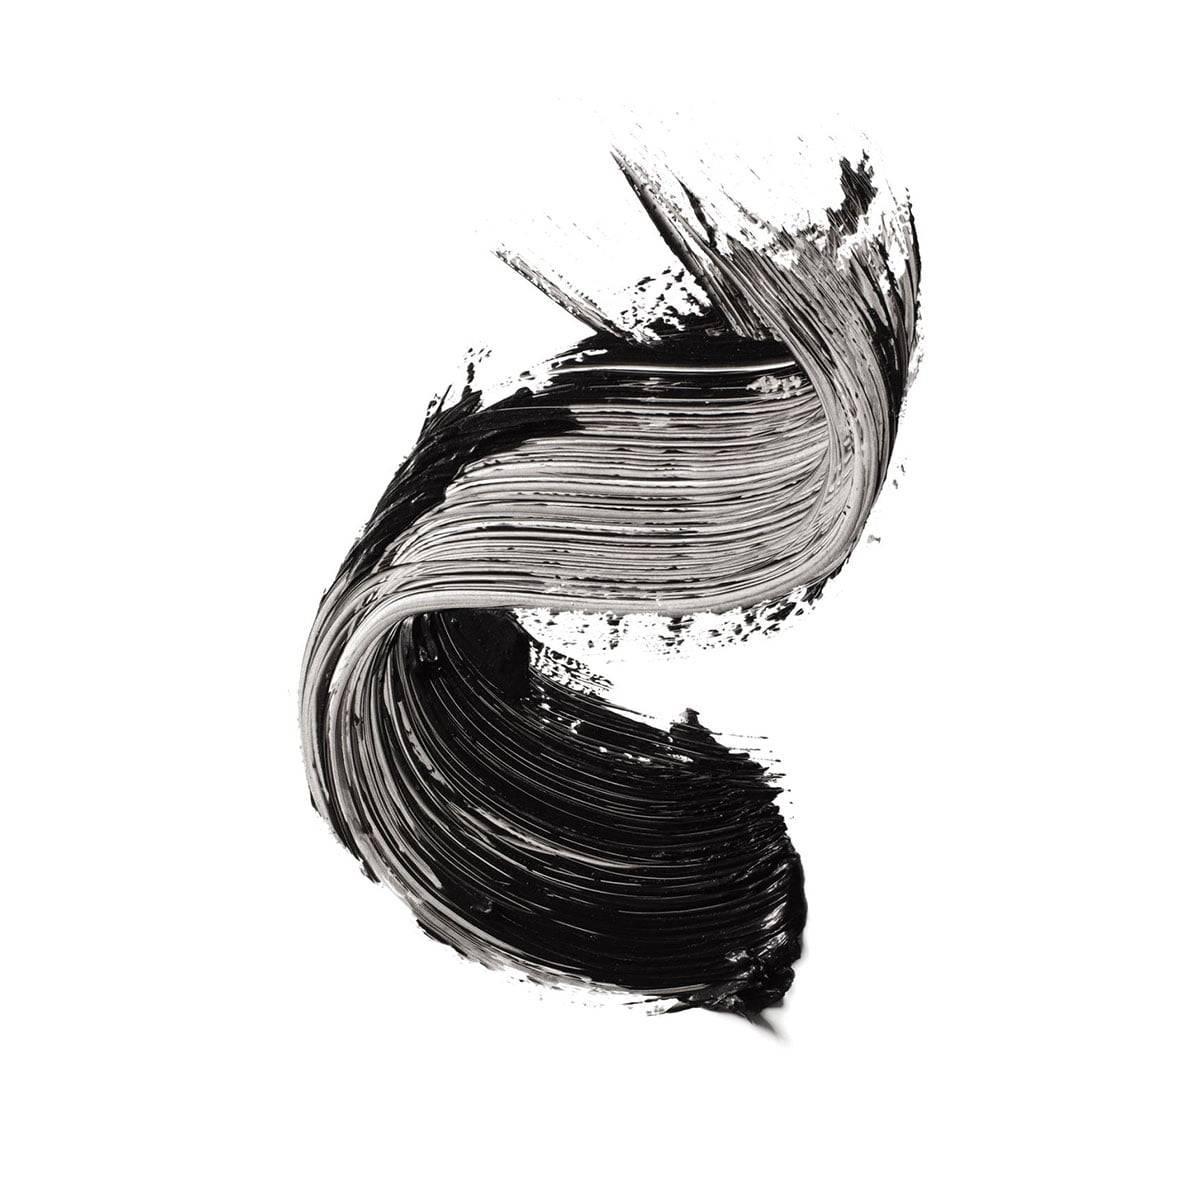 La Roche Posay Herkkä Toleriane Make up WATERPROOF_MASCARA_Black 33